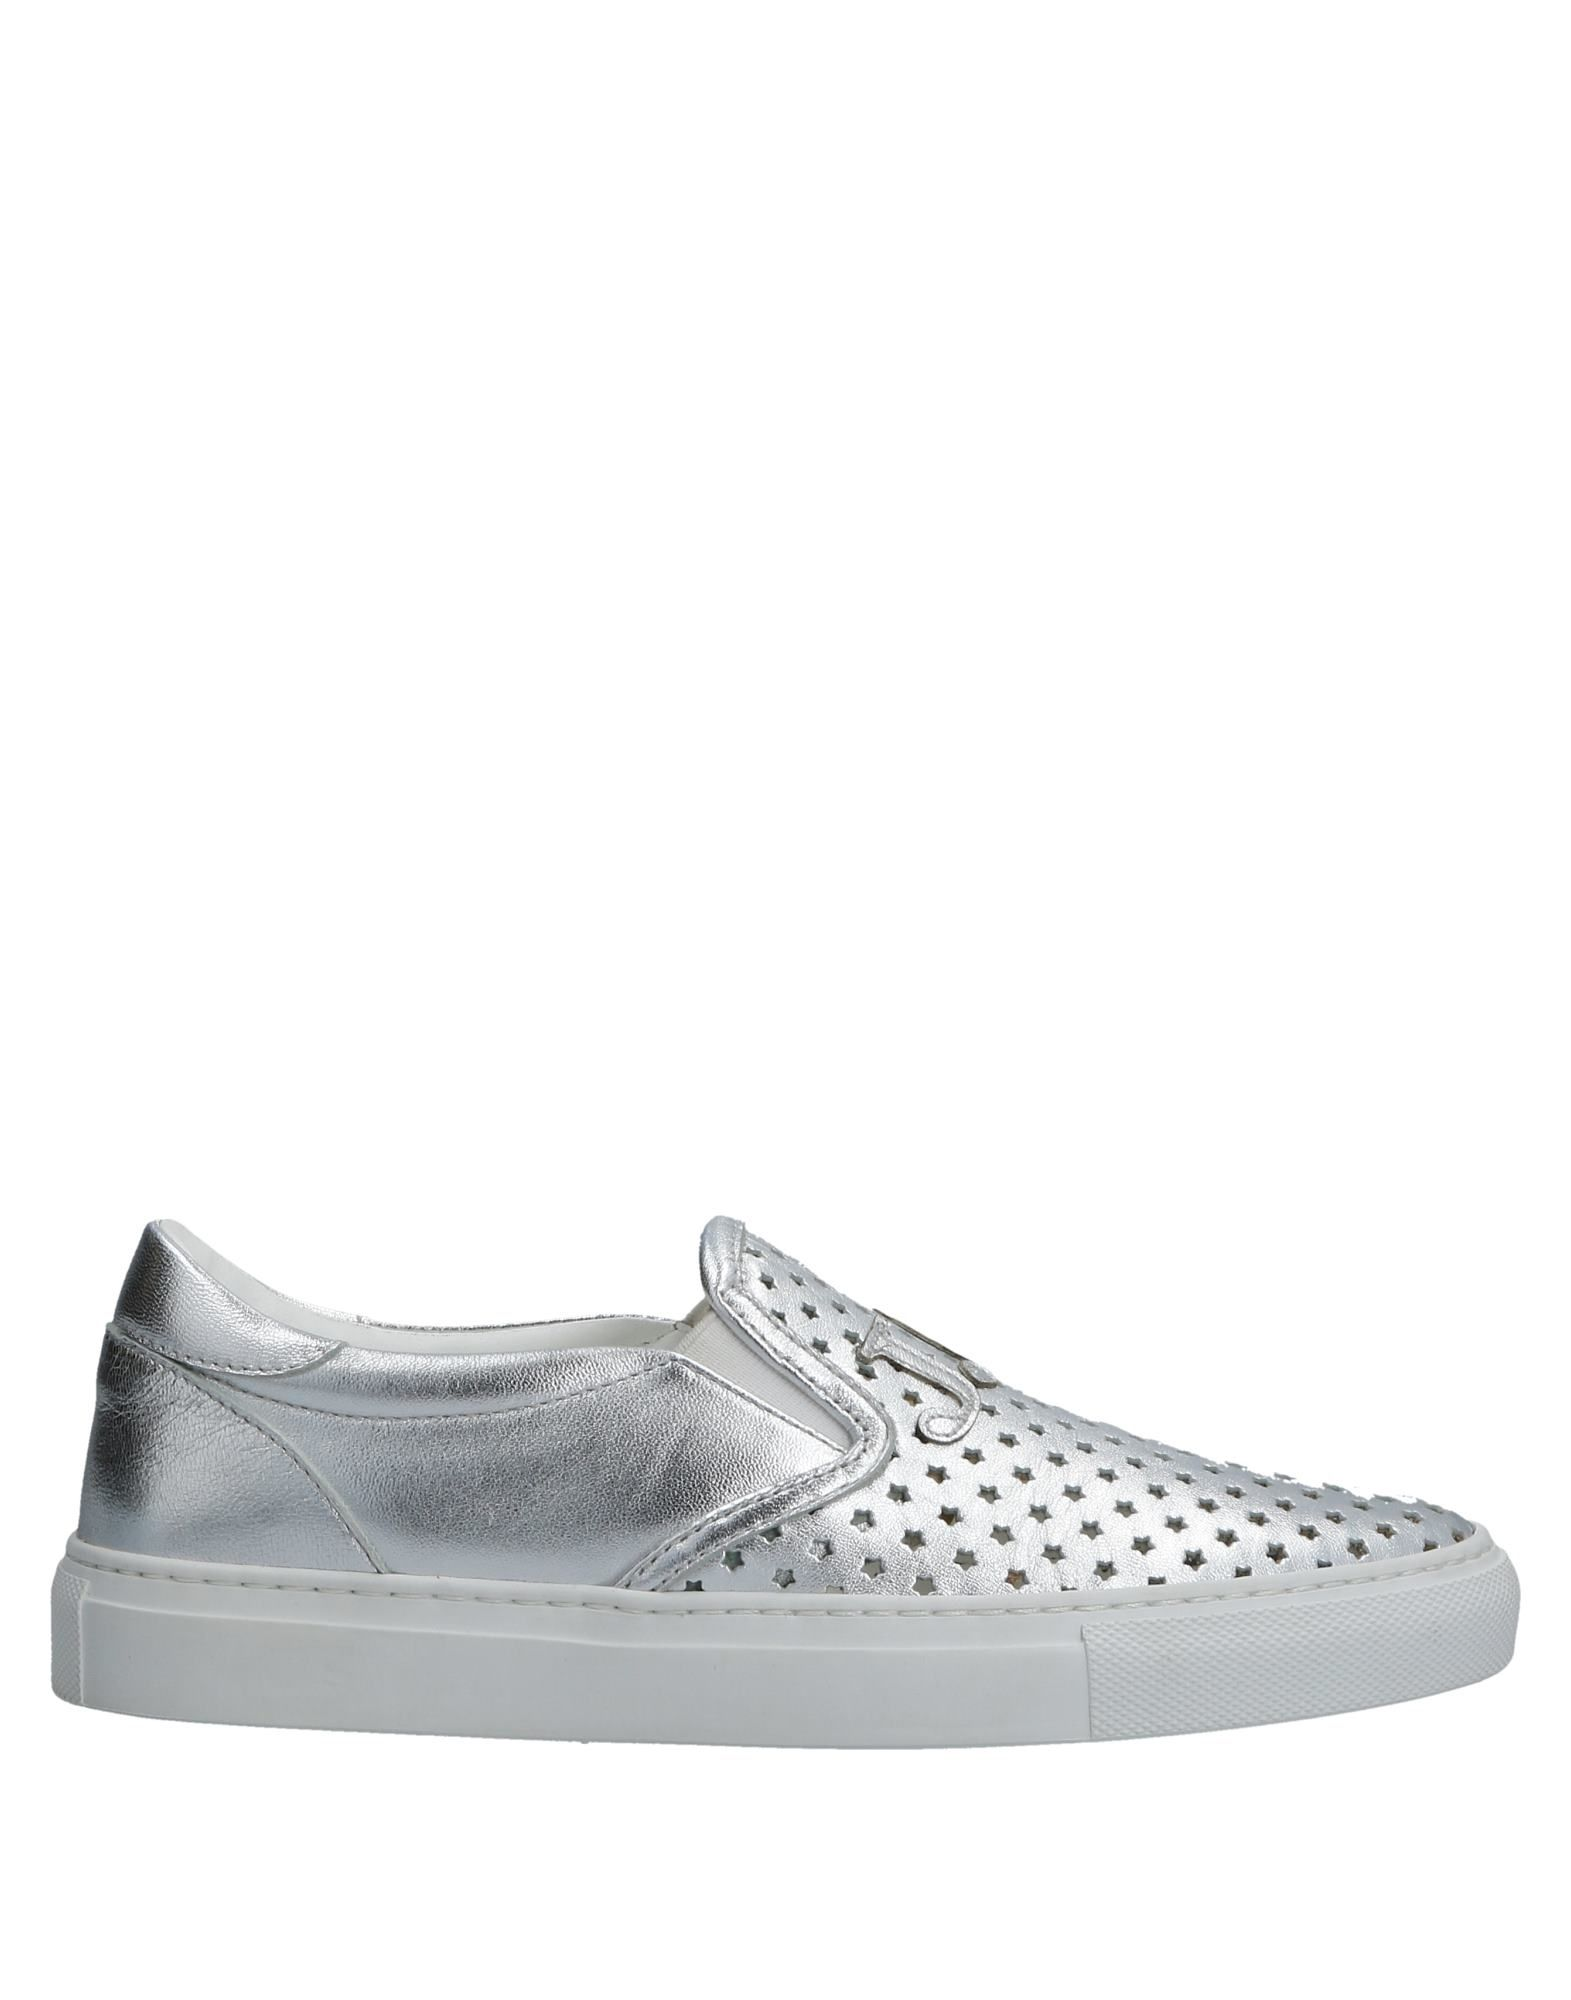 Stilvolle billige Schuhe John John John Galliano Sneakers Damen  11527551QL 4f88b0